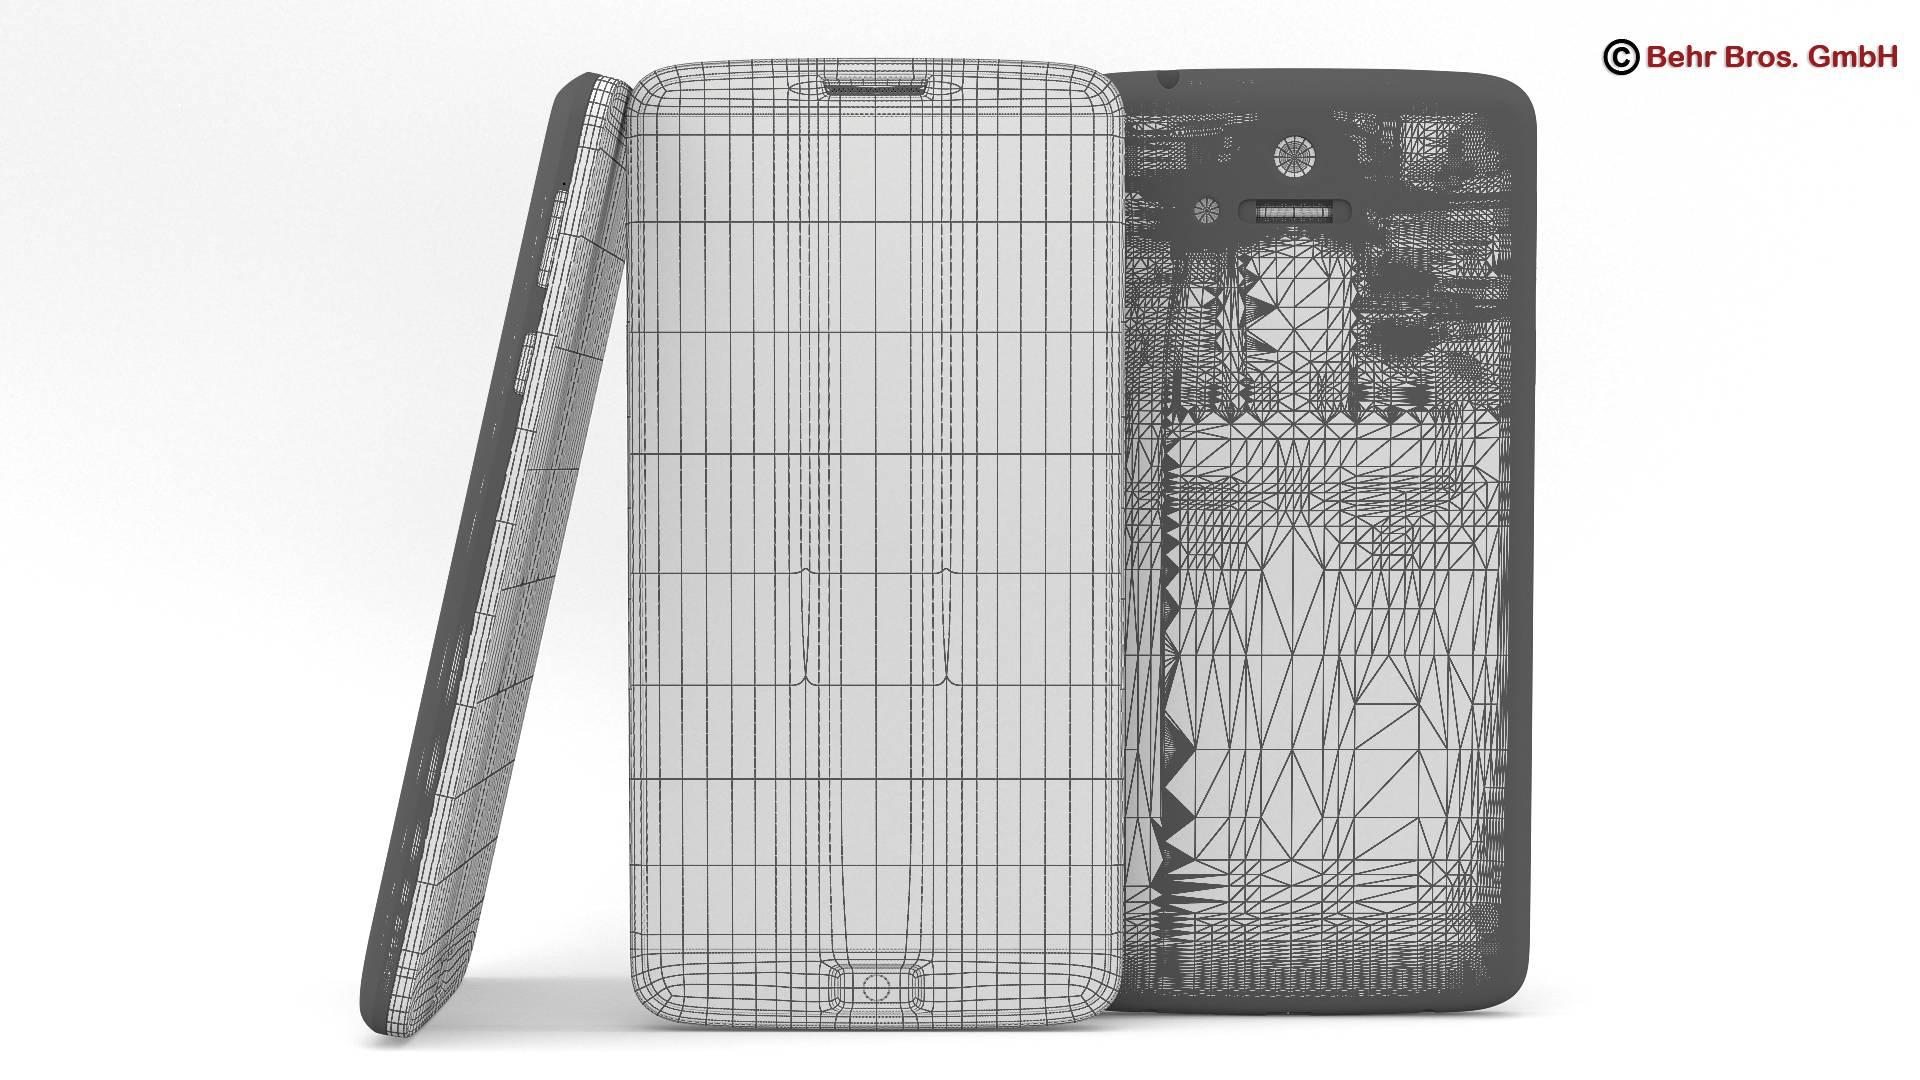 generic smartphone 6 inch 3d model 3ds max fbx c4d lwo ma mb obj 161669